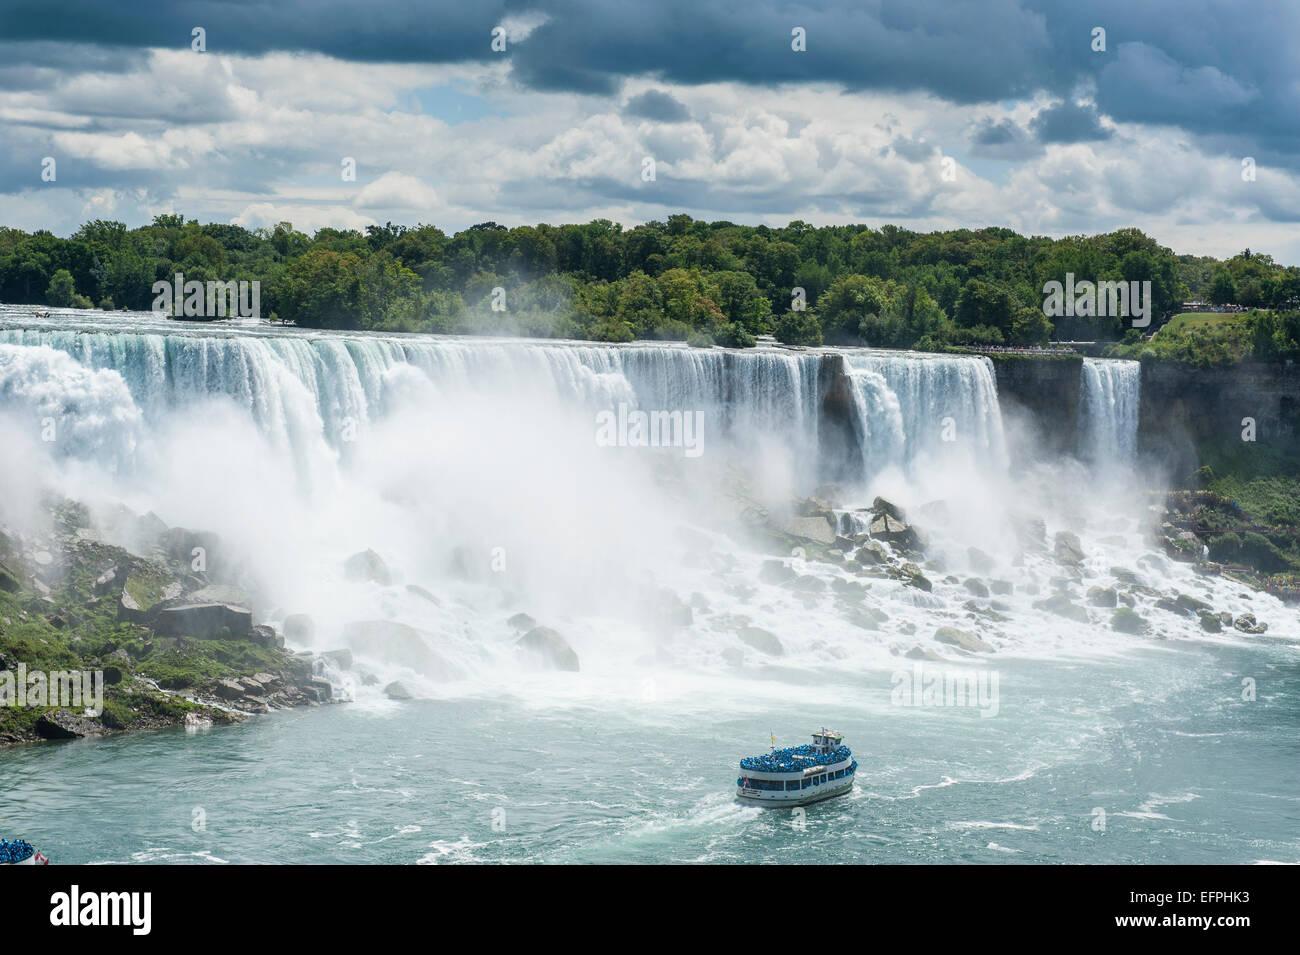 Blick auf die American Falls Teil der Niagarafälle, Ontario, Kanada, Nordamerika Stockbild